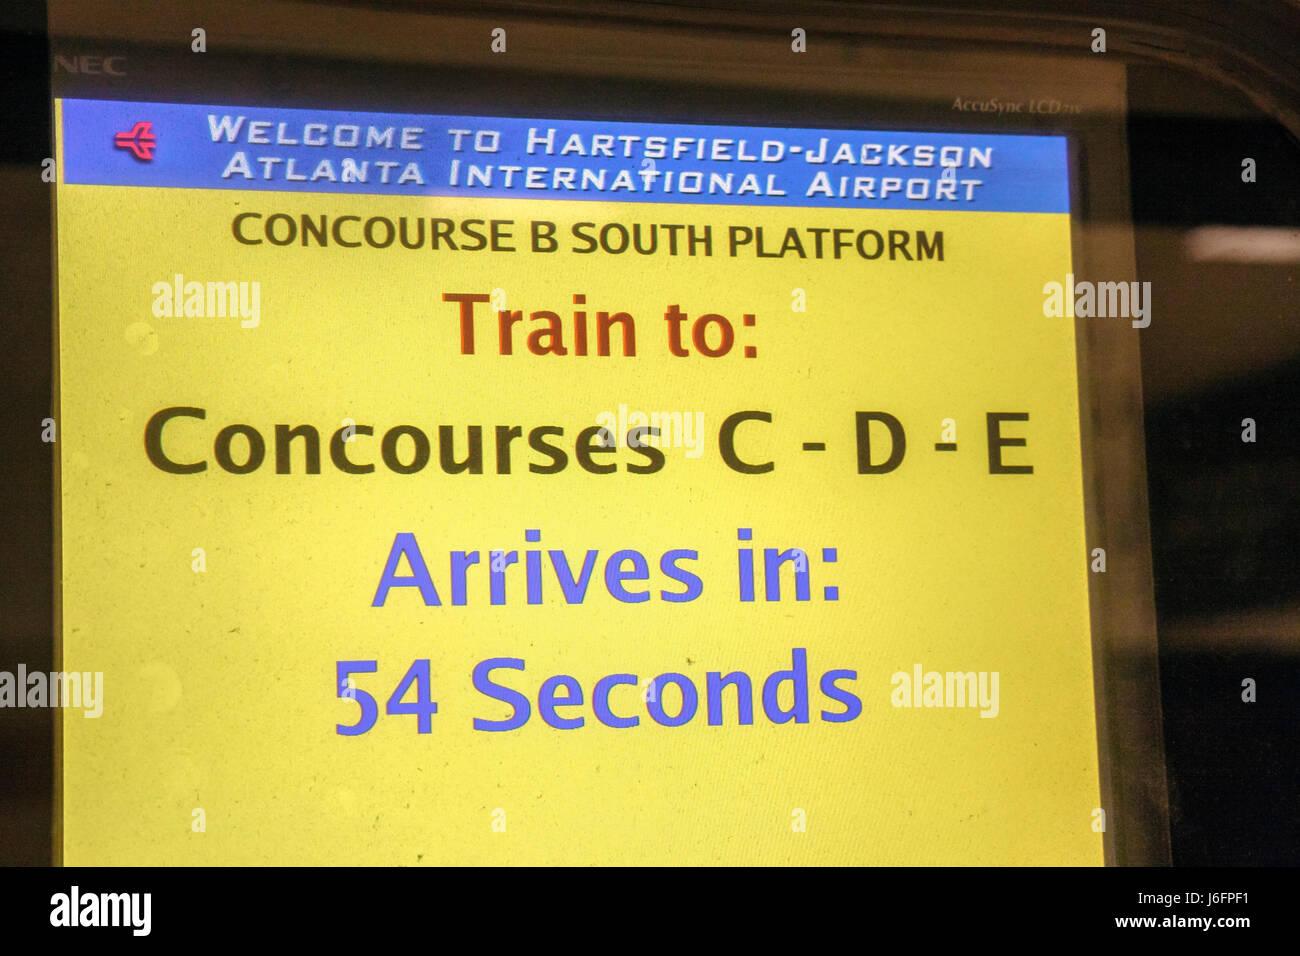 Atlanta Georgia Hartsfield-Jackson Atlanta International Airport information screen concourse train arrival schedule - Stock Image